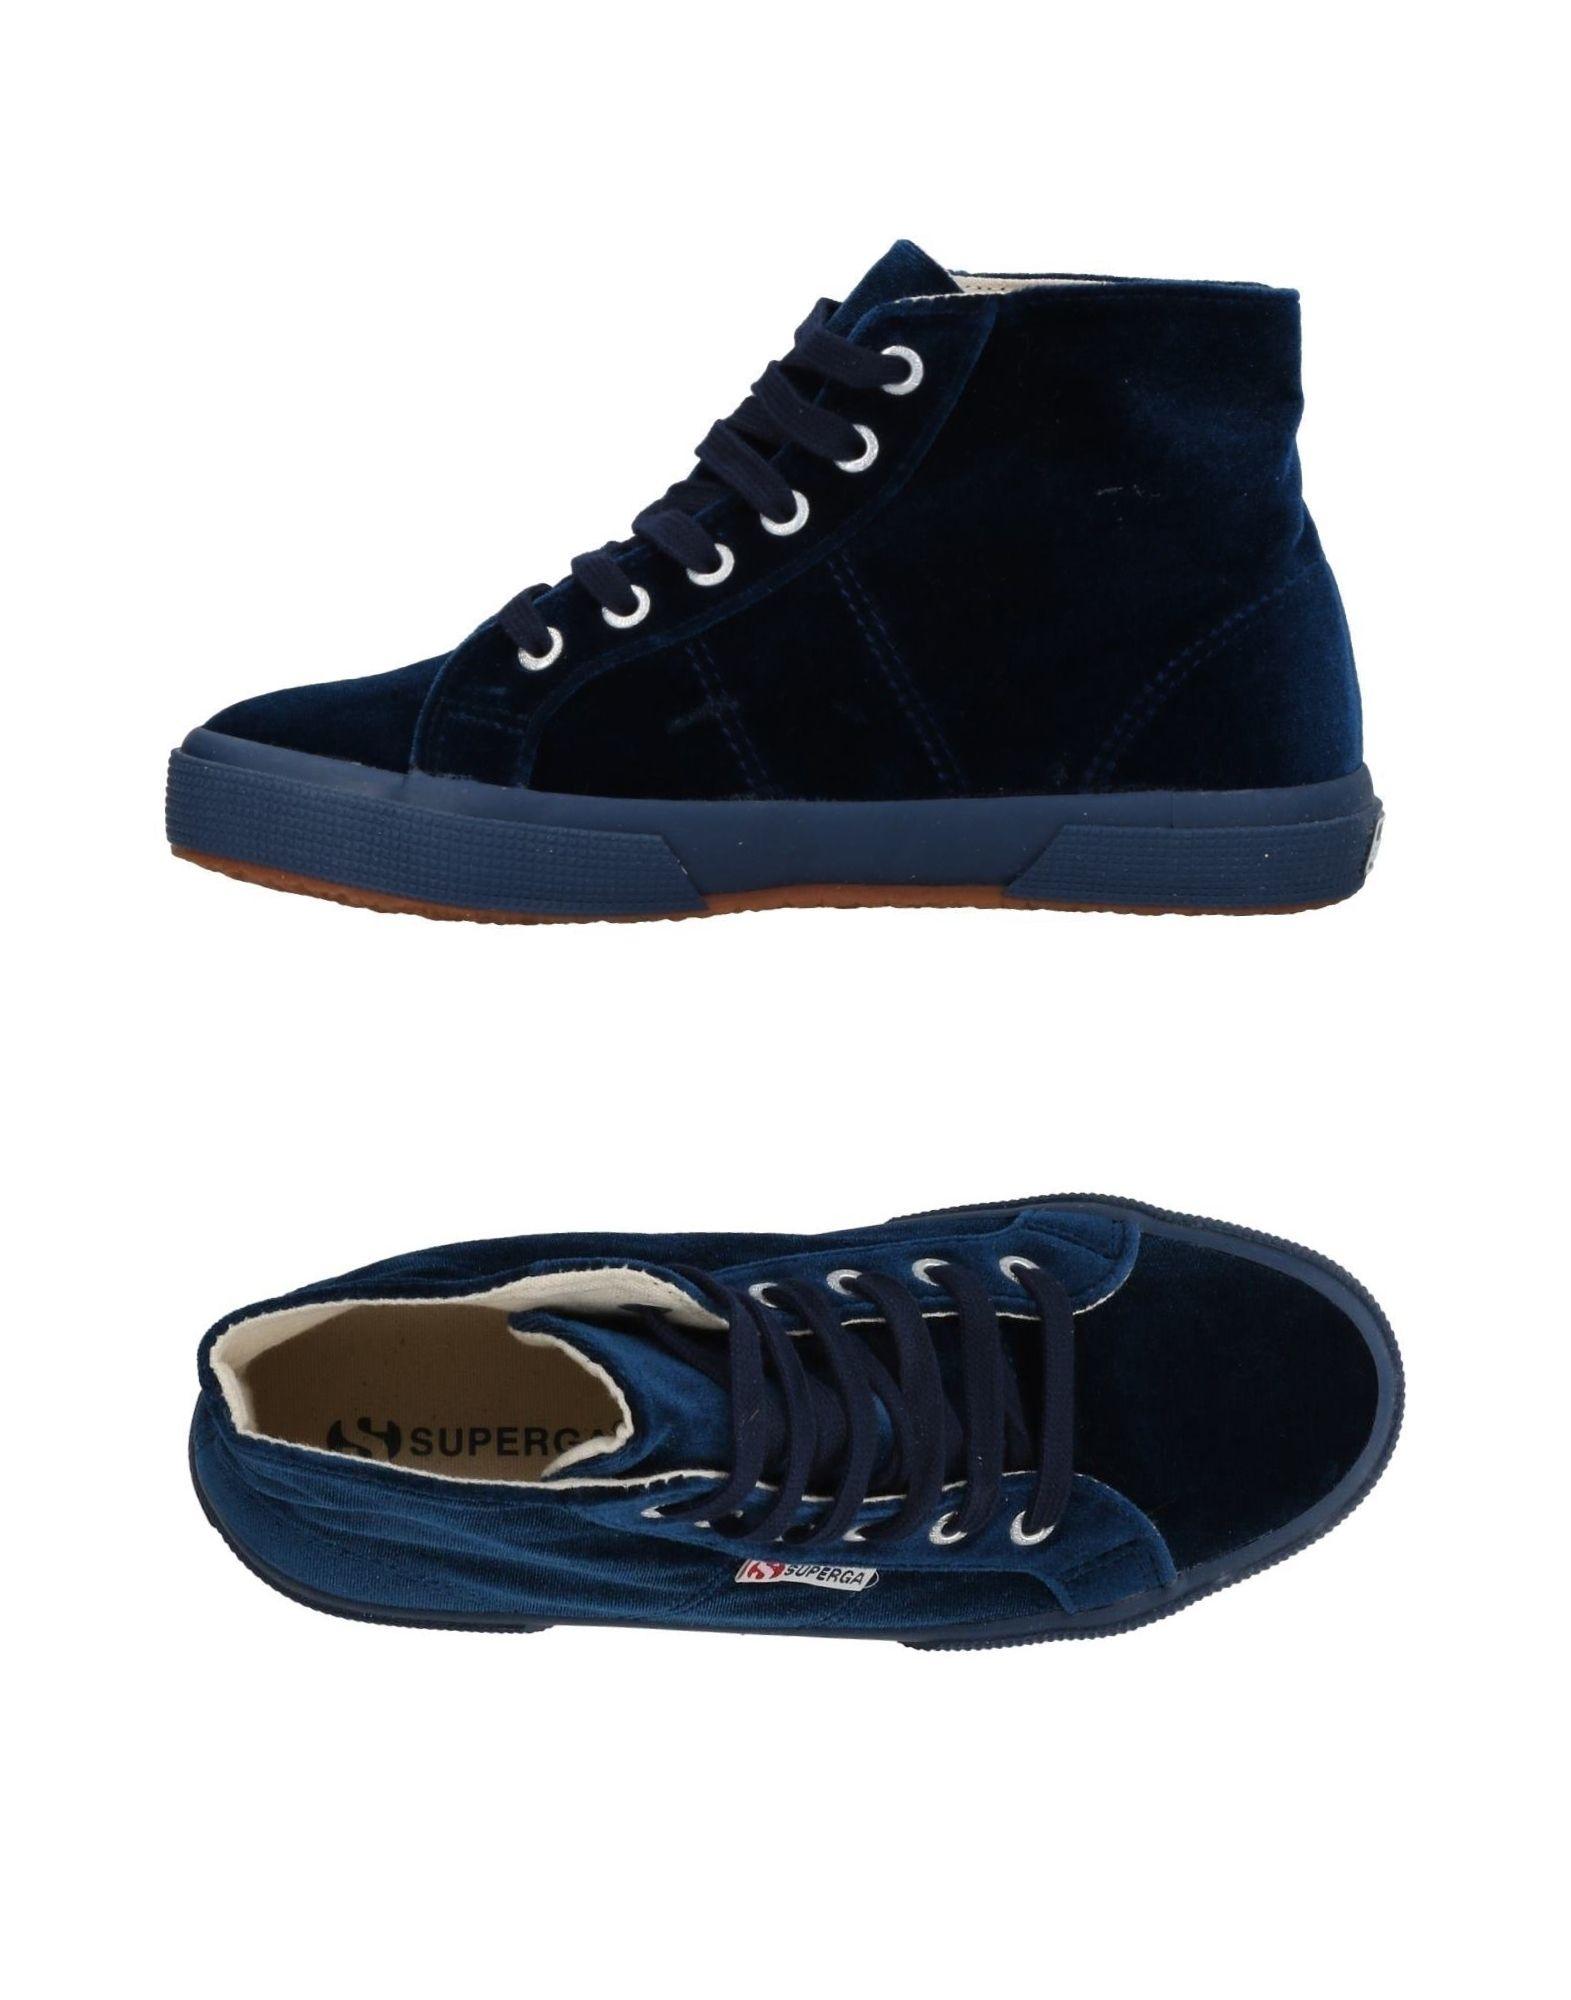 SUPERGA® Высокие кеды и кроссовки кеды кроссовки высокие dc council mid tx stone camo